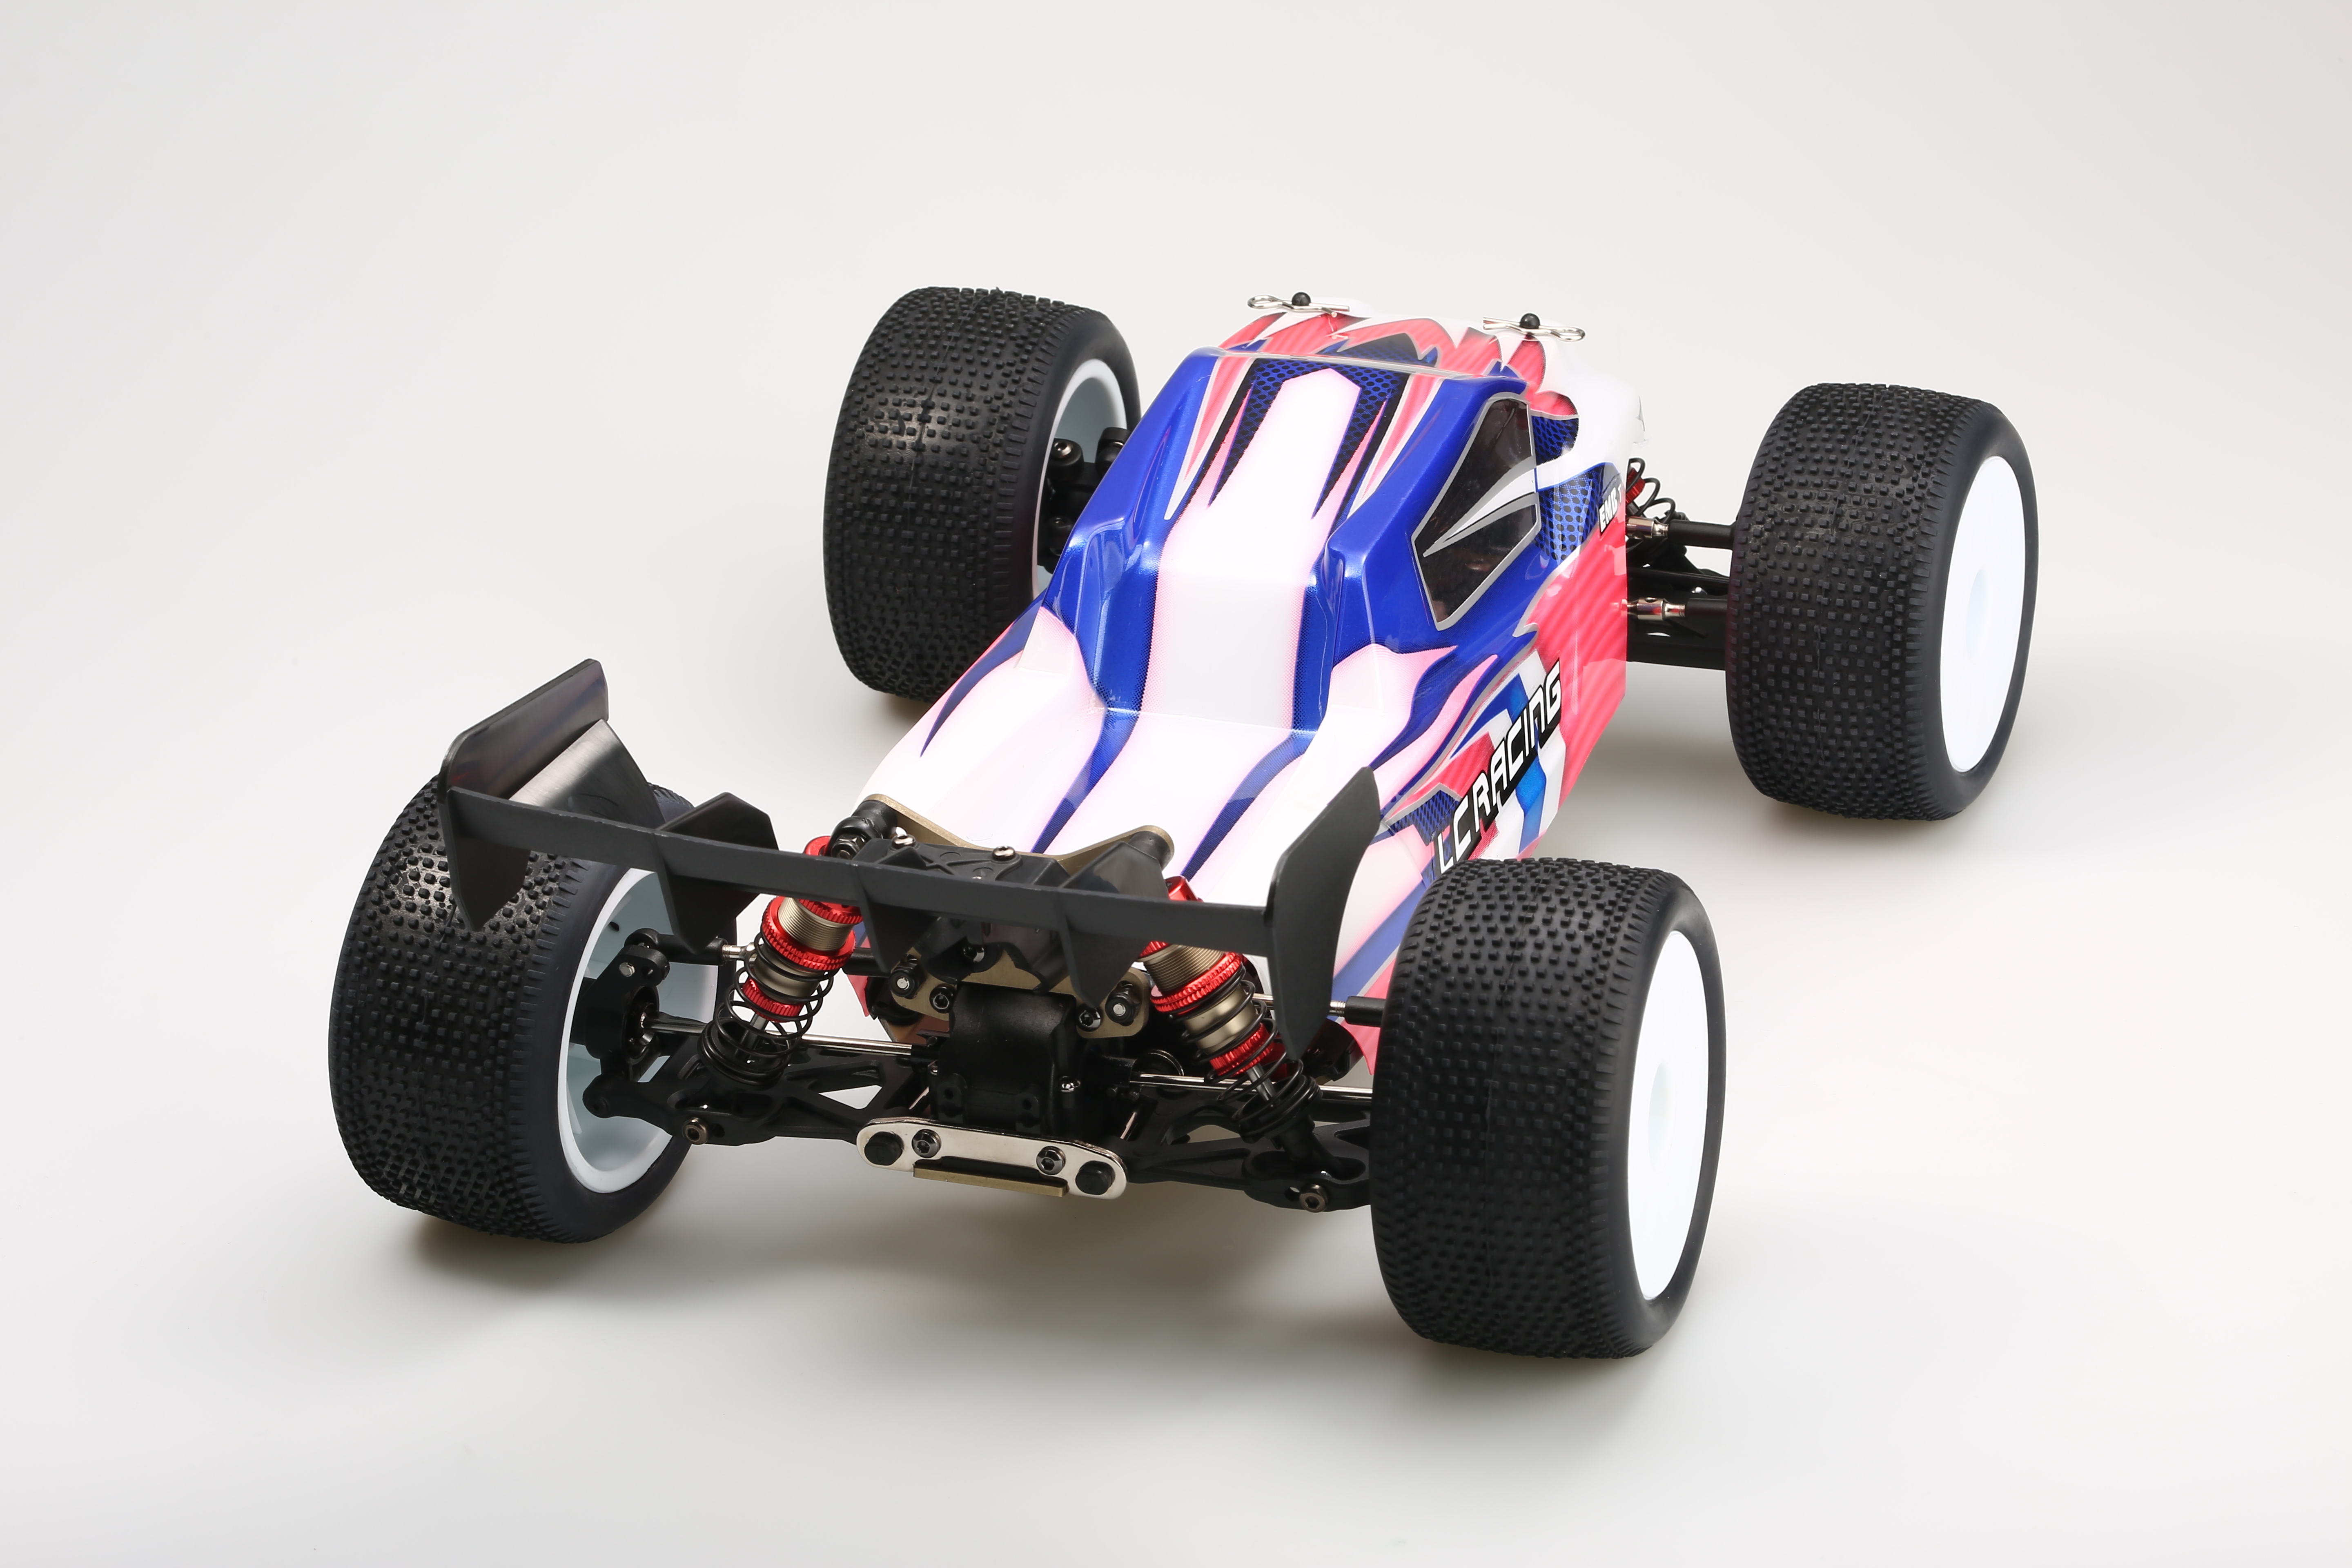 lc racing 1 14 4wd mini sem escova truggy rtr ep rc carro fora da estrada